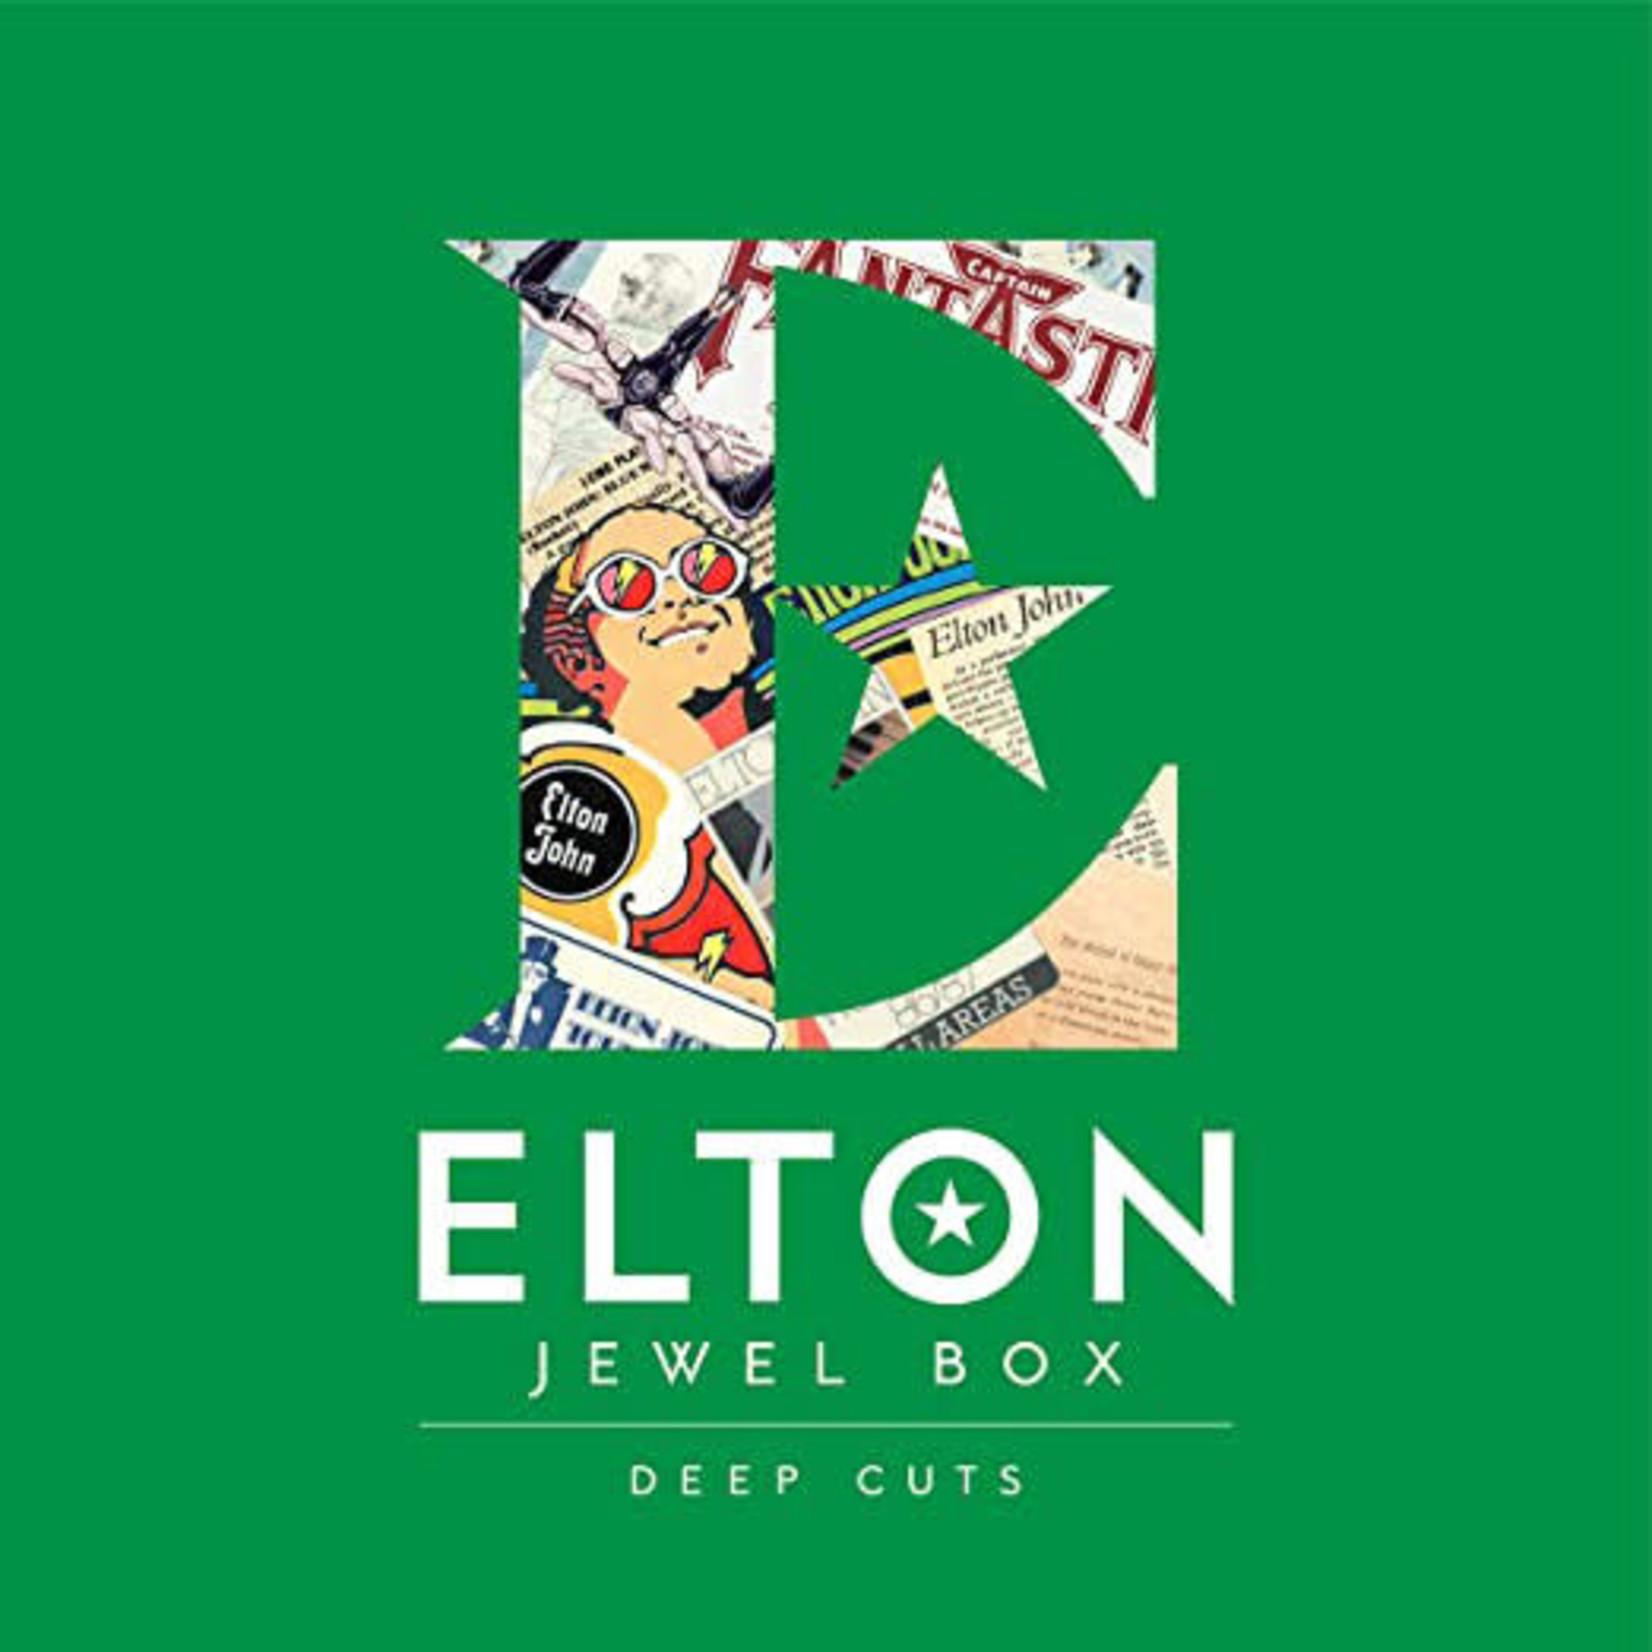 ELTON JOHN JEWEL BOX: DEEP CUTS (4LP)